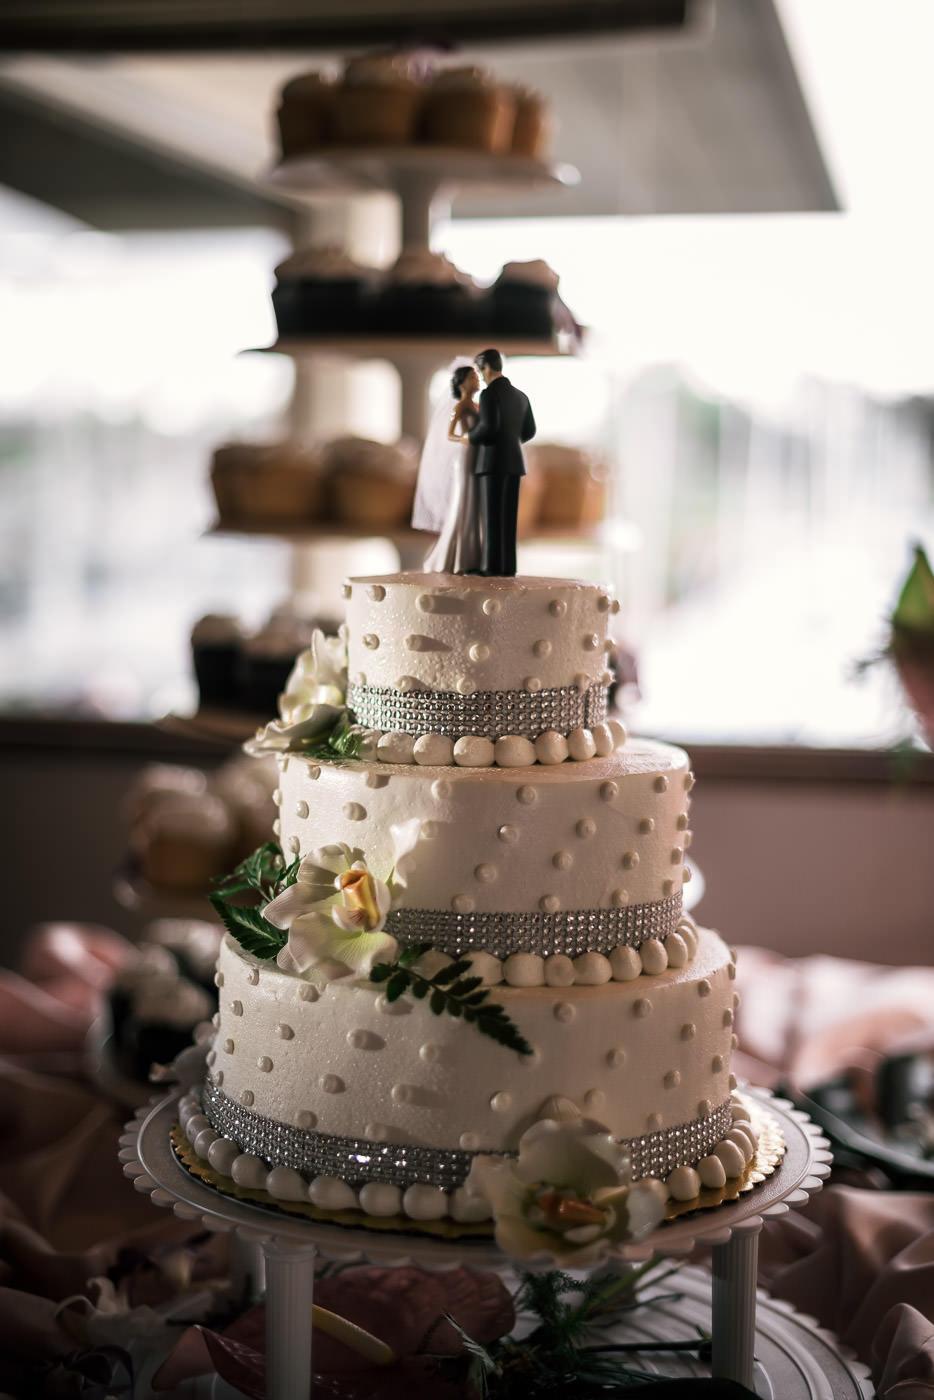 Three tierd wedding cake with rhinestone, flower, and fern detials.